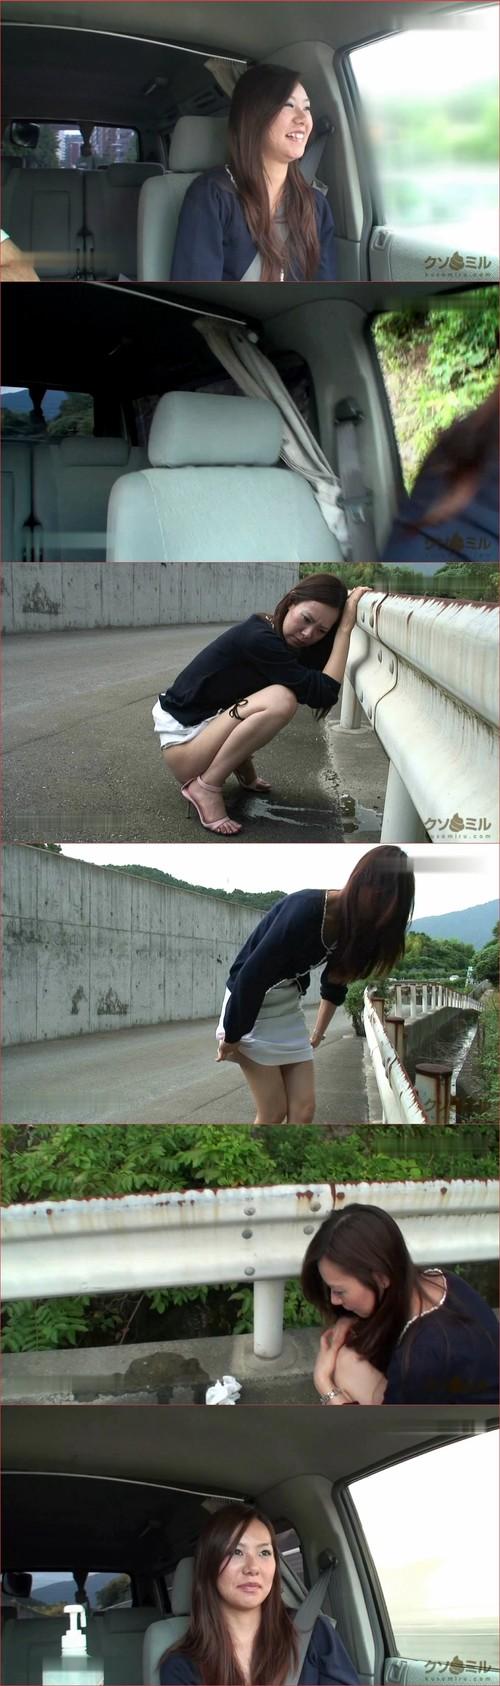 Field feces Fukasawa Anna amateur poop